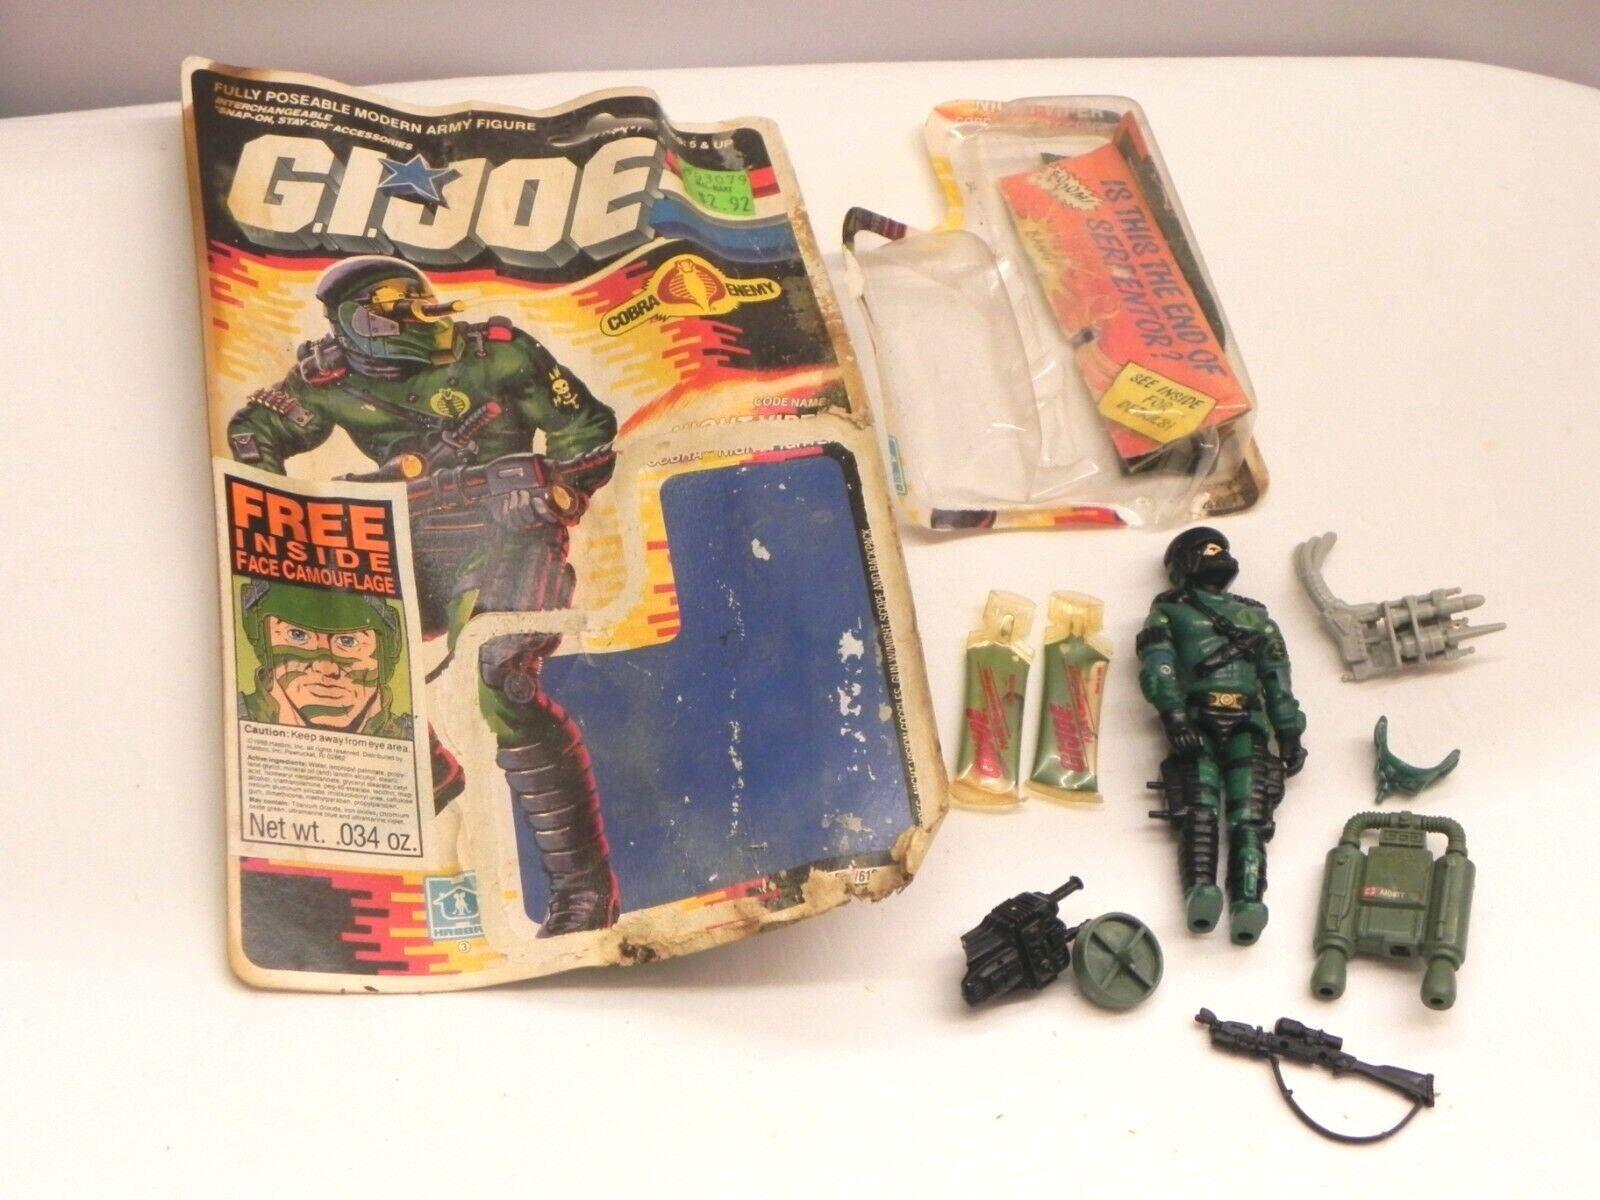 1988 1989 Vintage GI Joe Cobra Night Fighter Viper Action Figure Camouflage READ